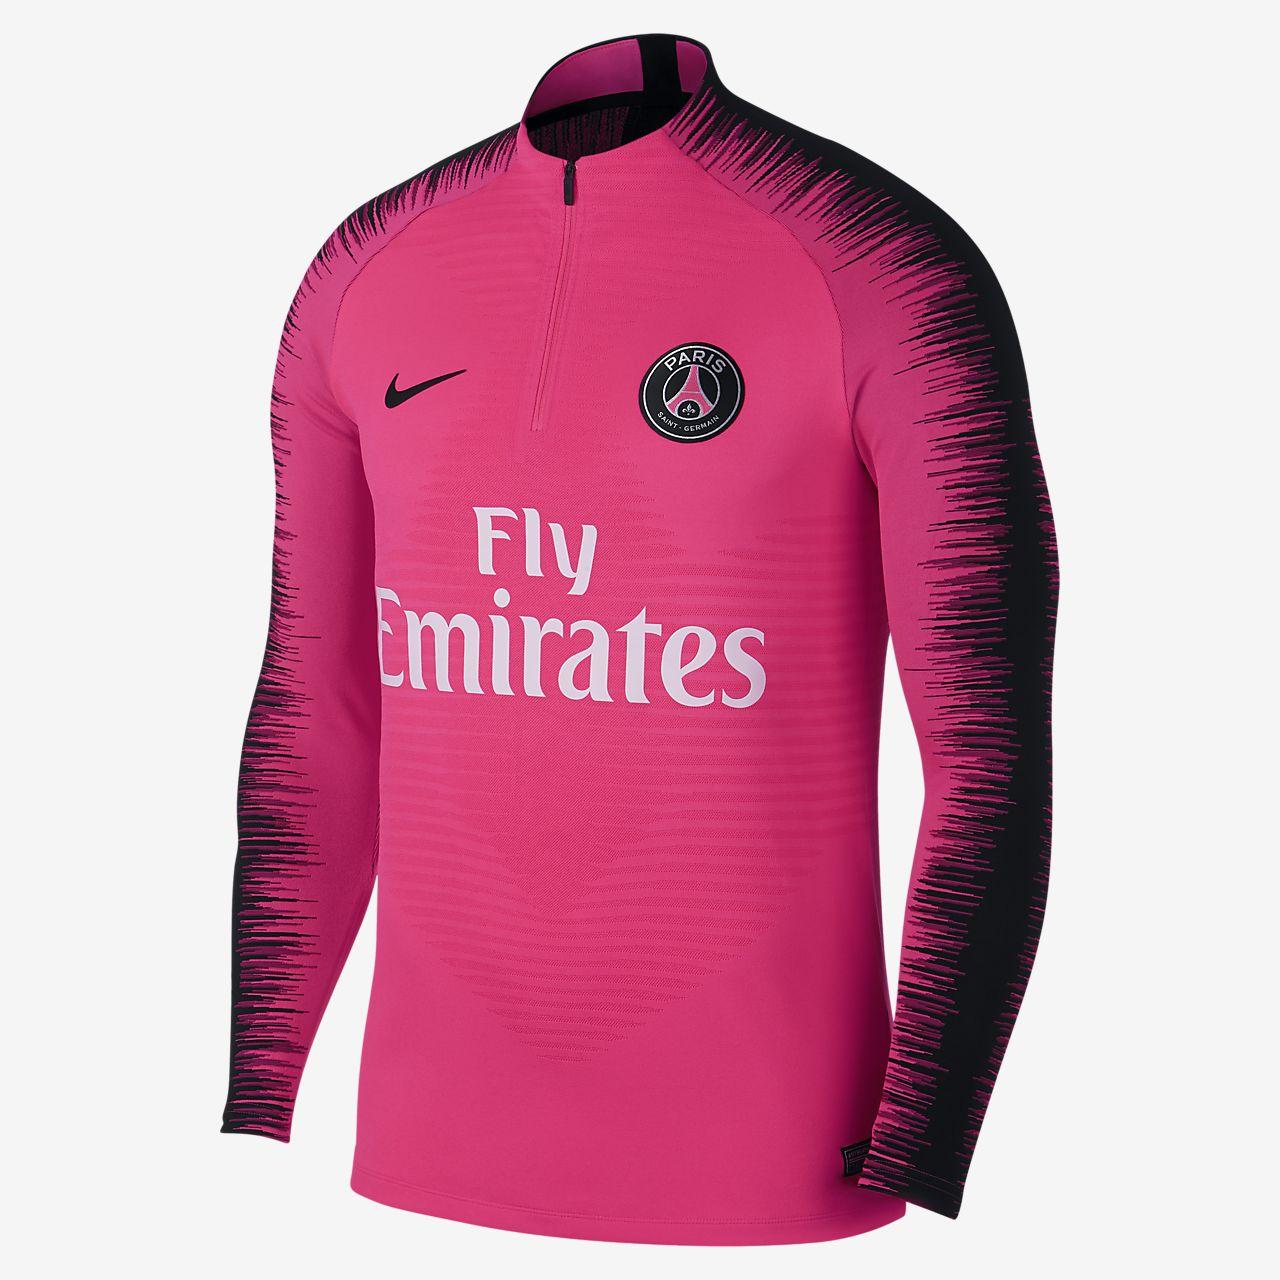 Pánské fotbalové tričko s dlouhým rukávem Paris Saint-Germain VaporKnit Strike Drill